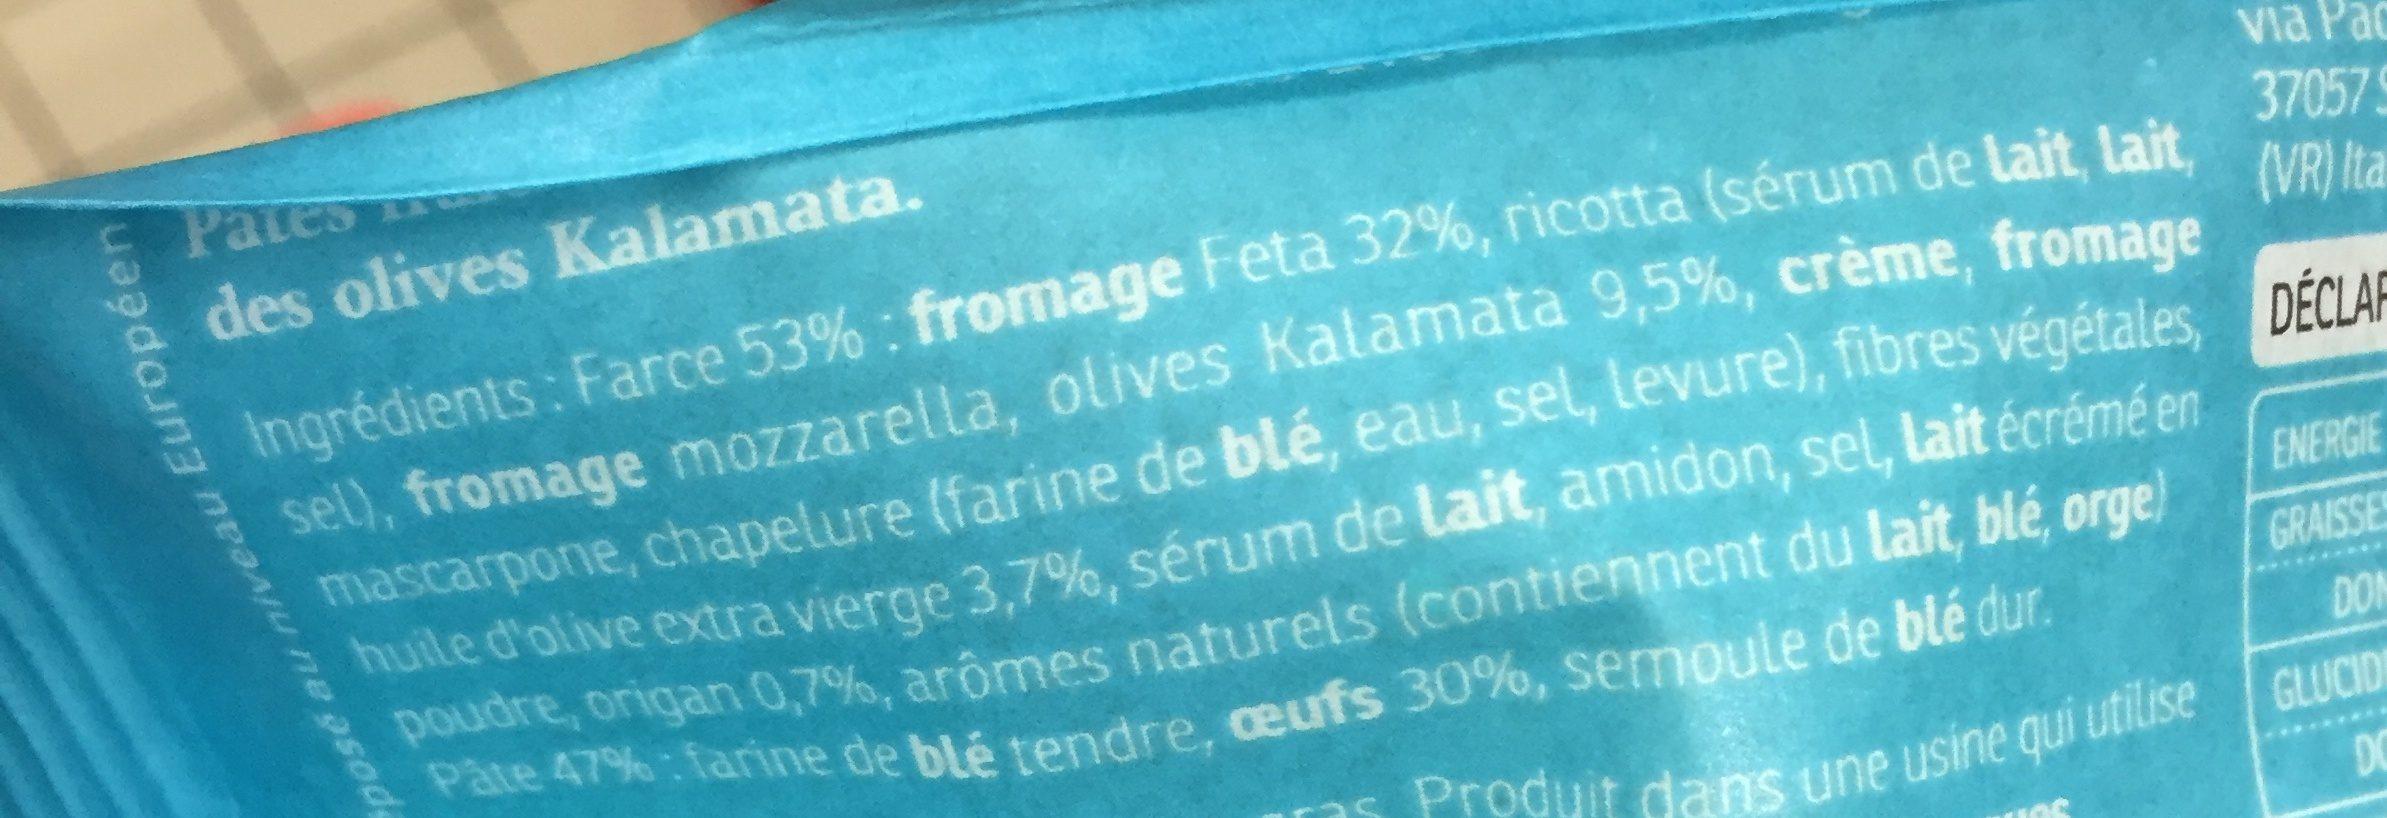 Feta et olives kalamata - Ingrédients